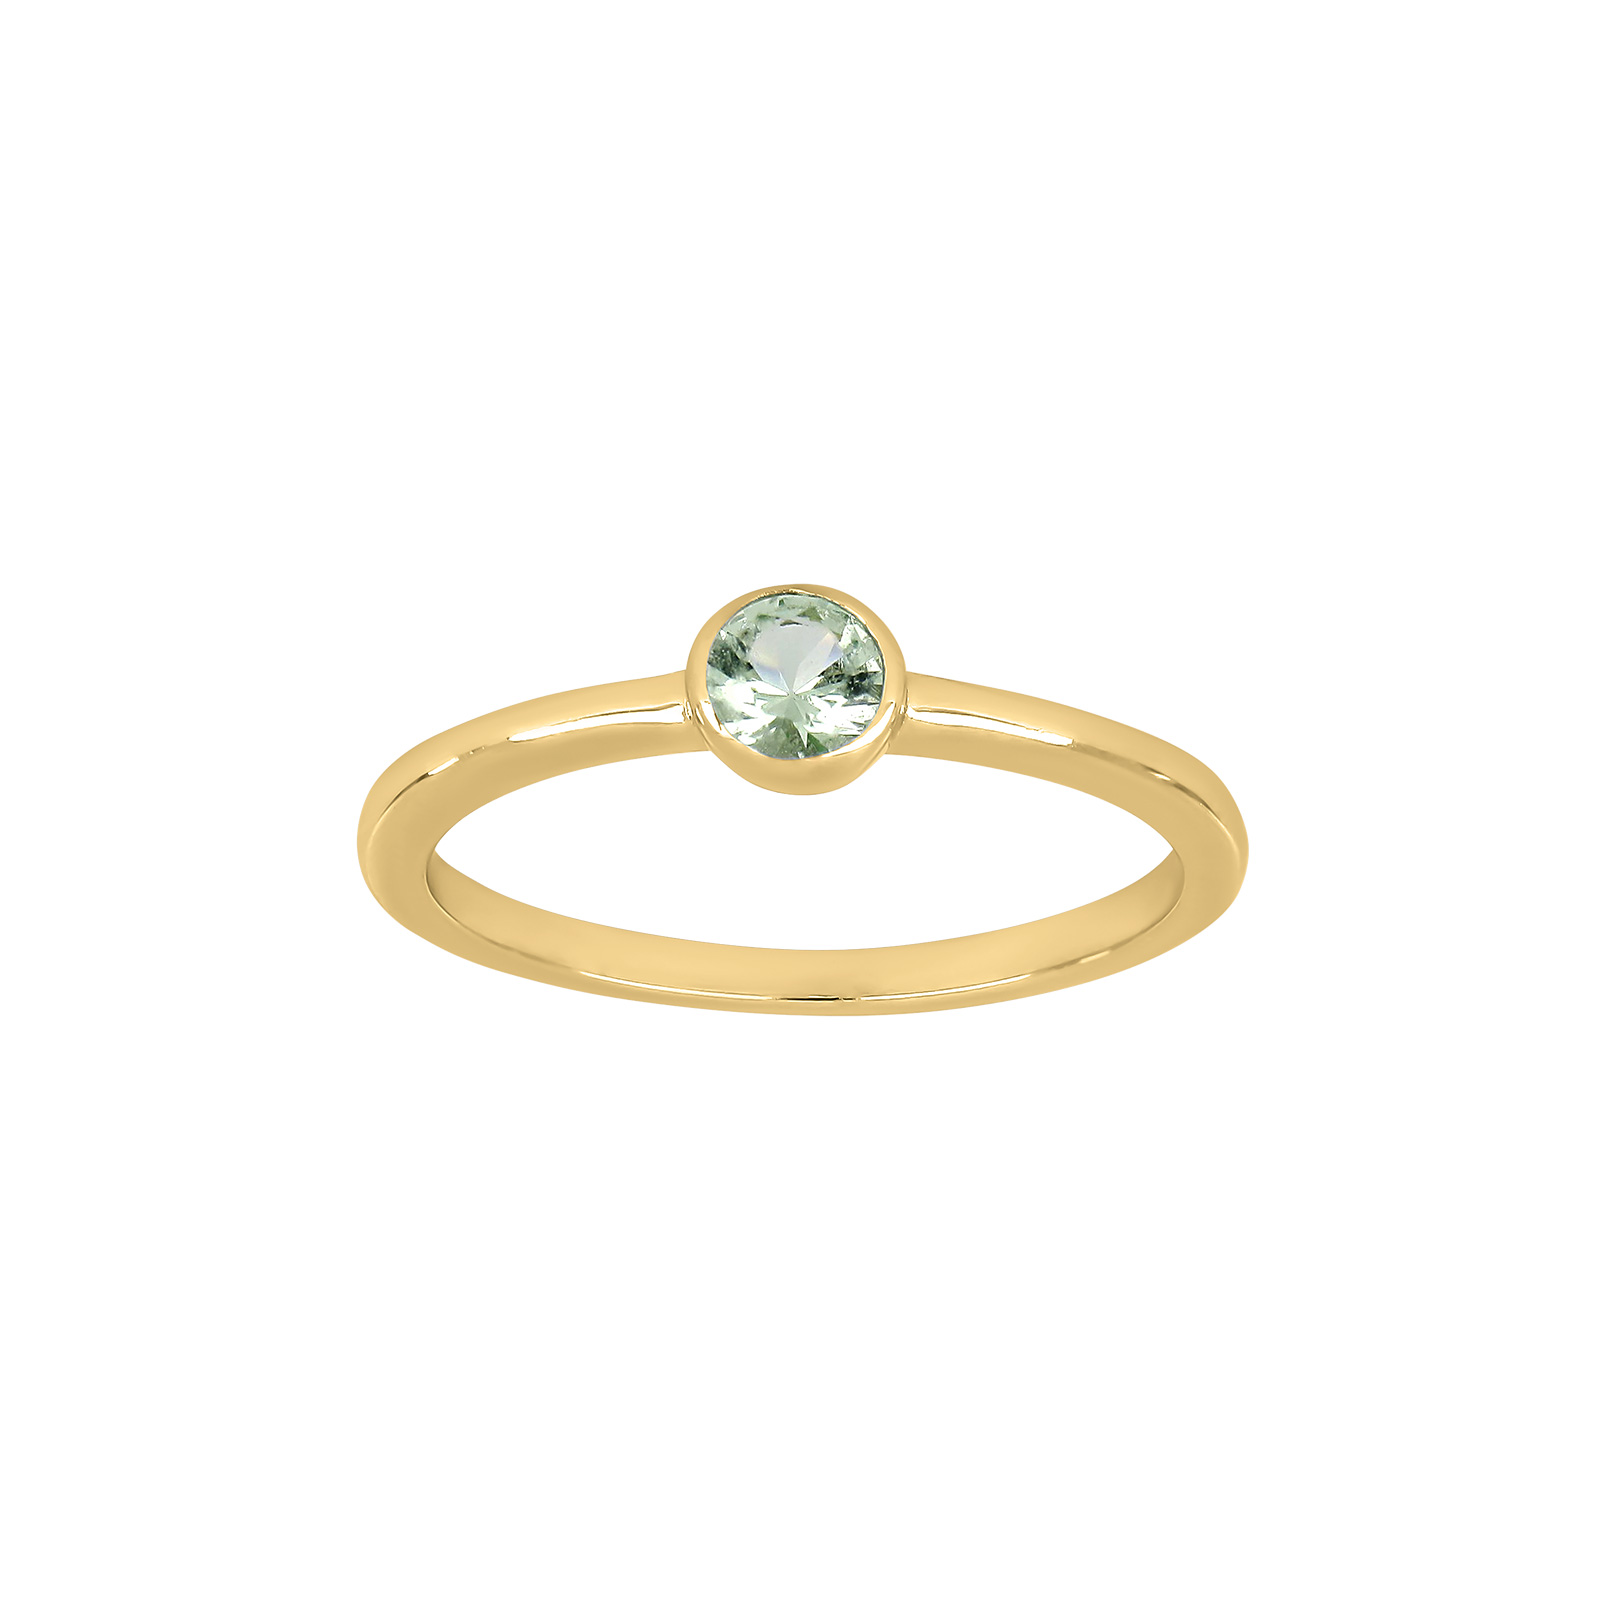 Forgyldt sølv ring med farvede zirkon i rørfatning fra Joanli Nor